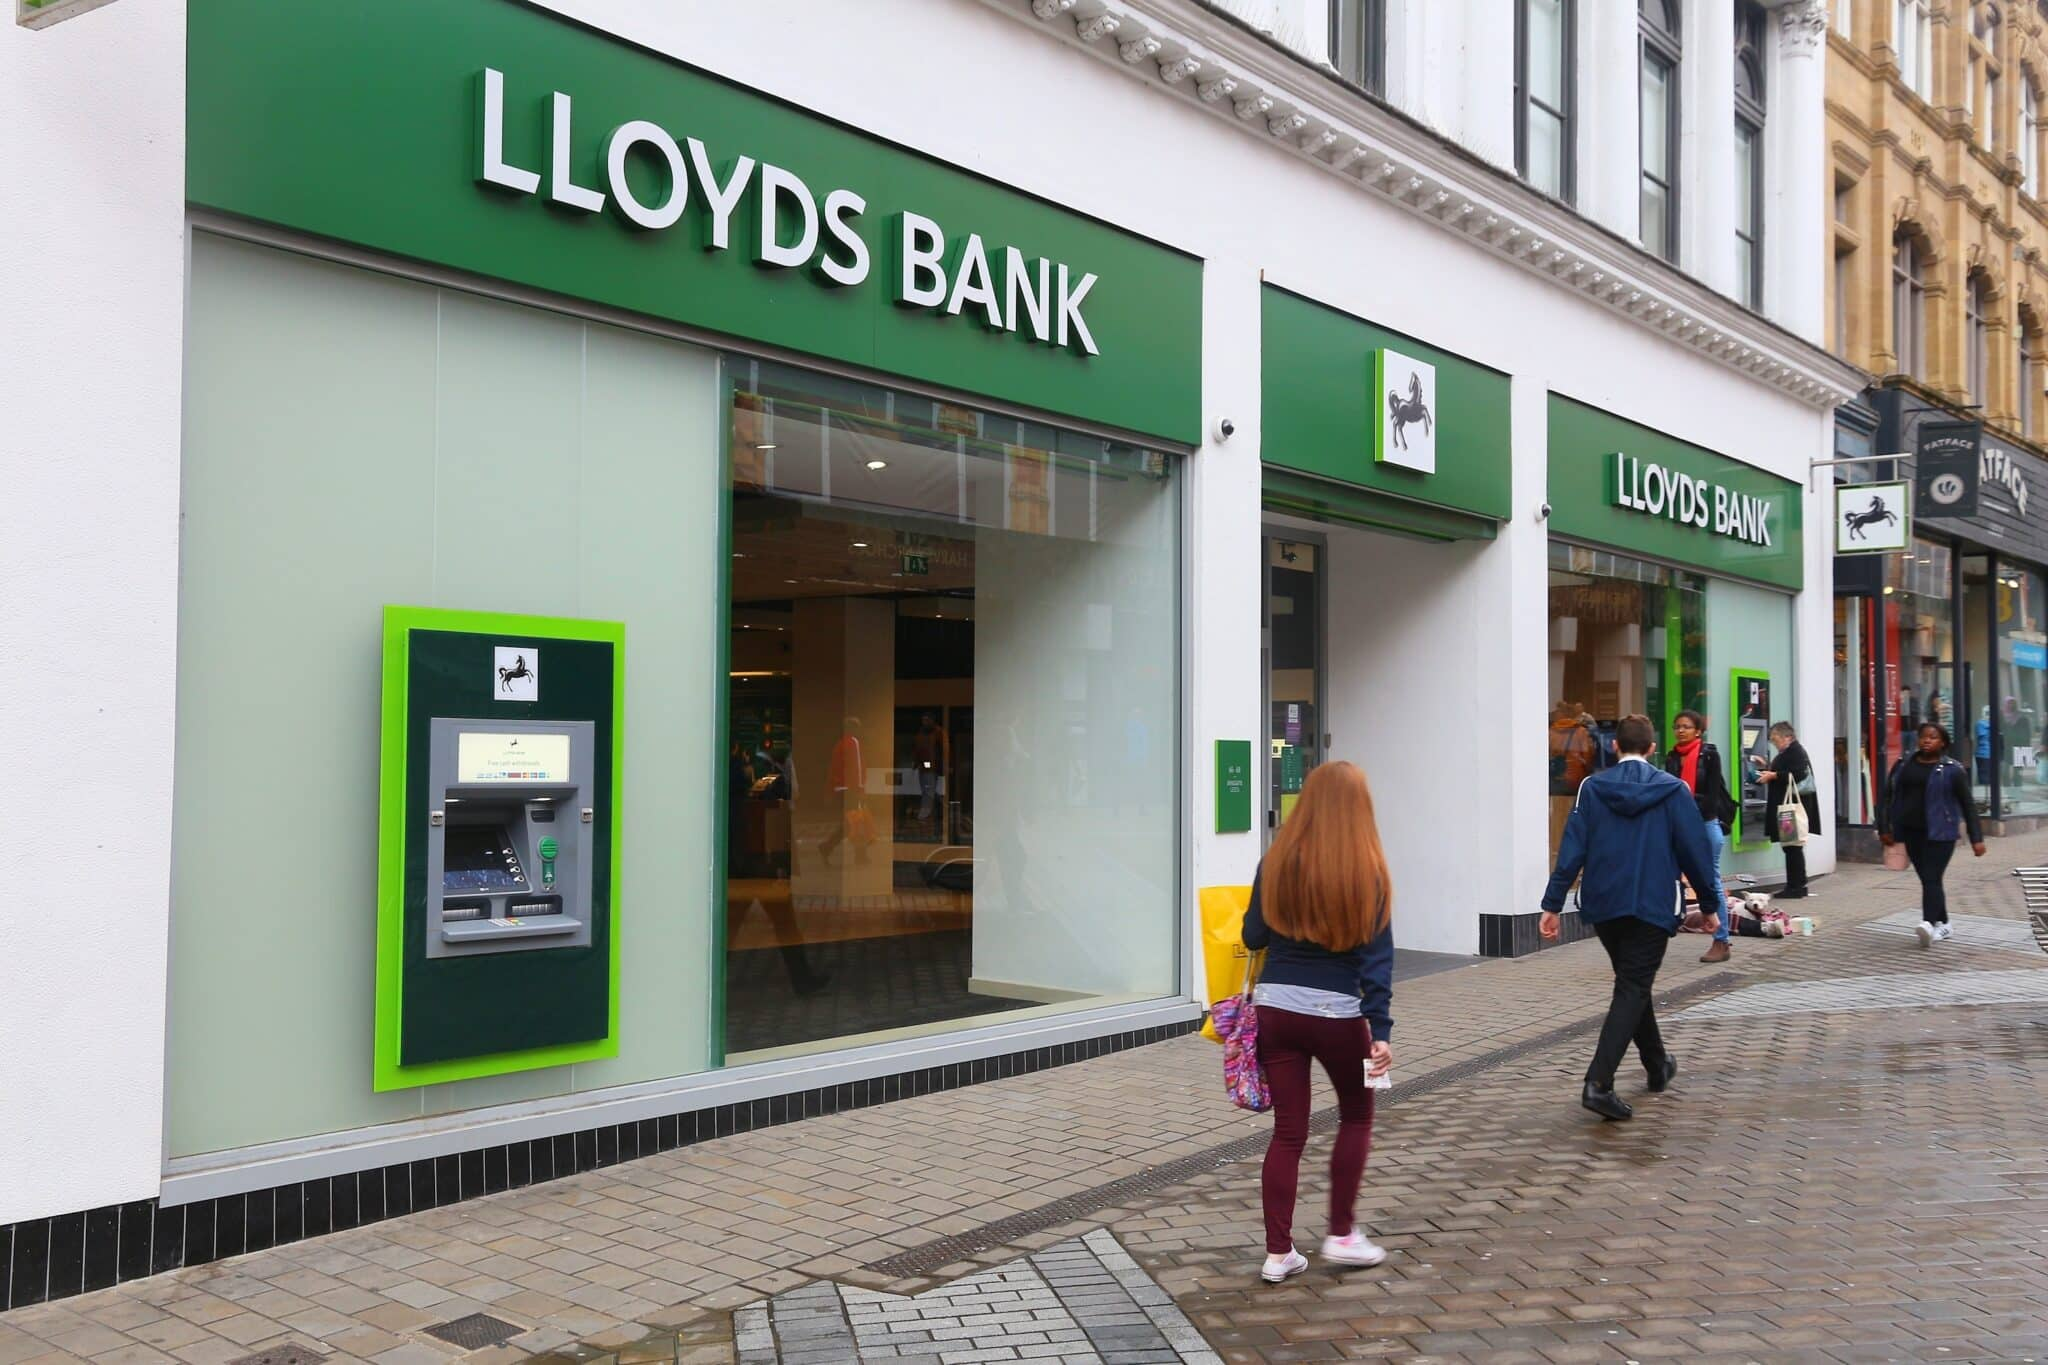 Lloyds profits soar as Covid loan loss provisions reduced